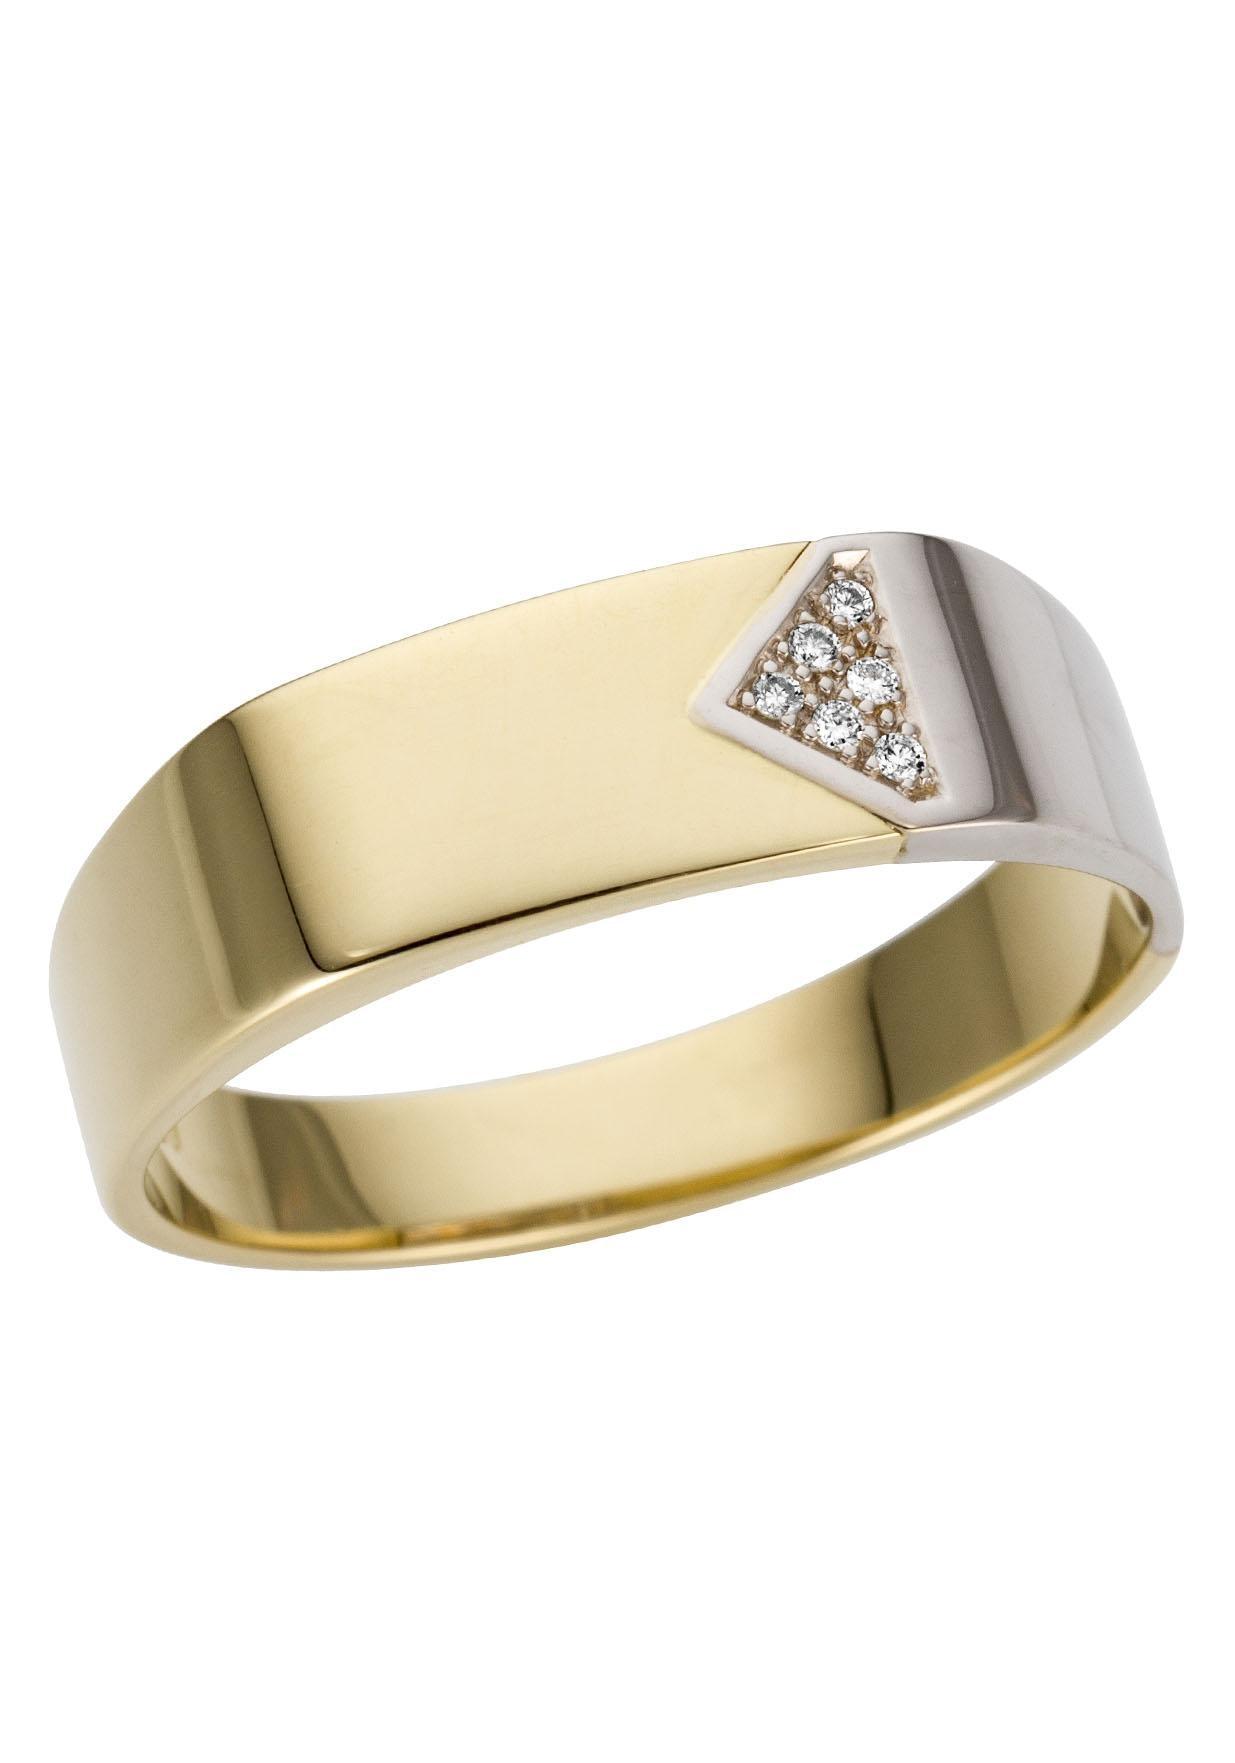 Firetti Goldring Glanz rhodiniert massiv   Schmuck > Ringe > Goldringe   Goldfarben   Firetti